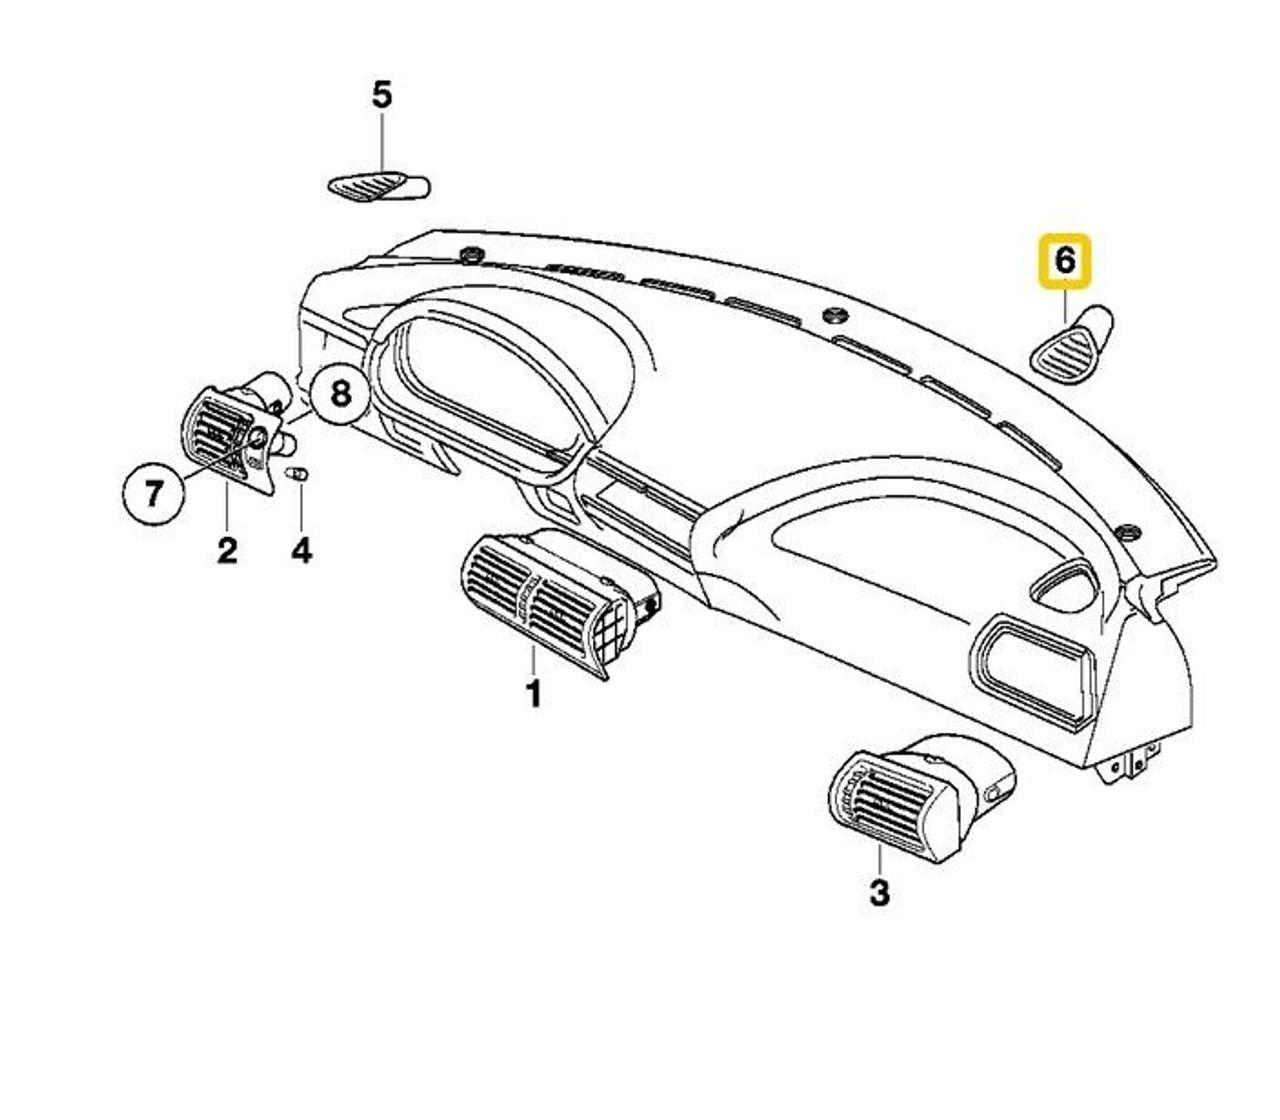 genuine bmw z3 instrument panel beige defroster nozzle right 96 02 64228399938 theis motorsport [ 1280 x 1120 Pixel ]